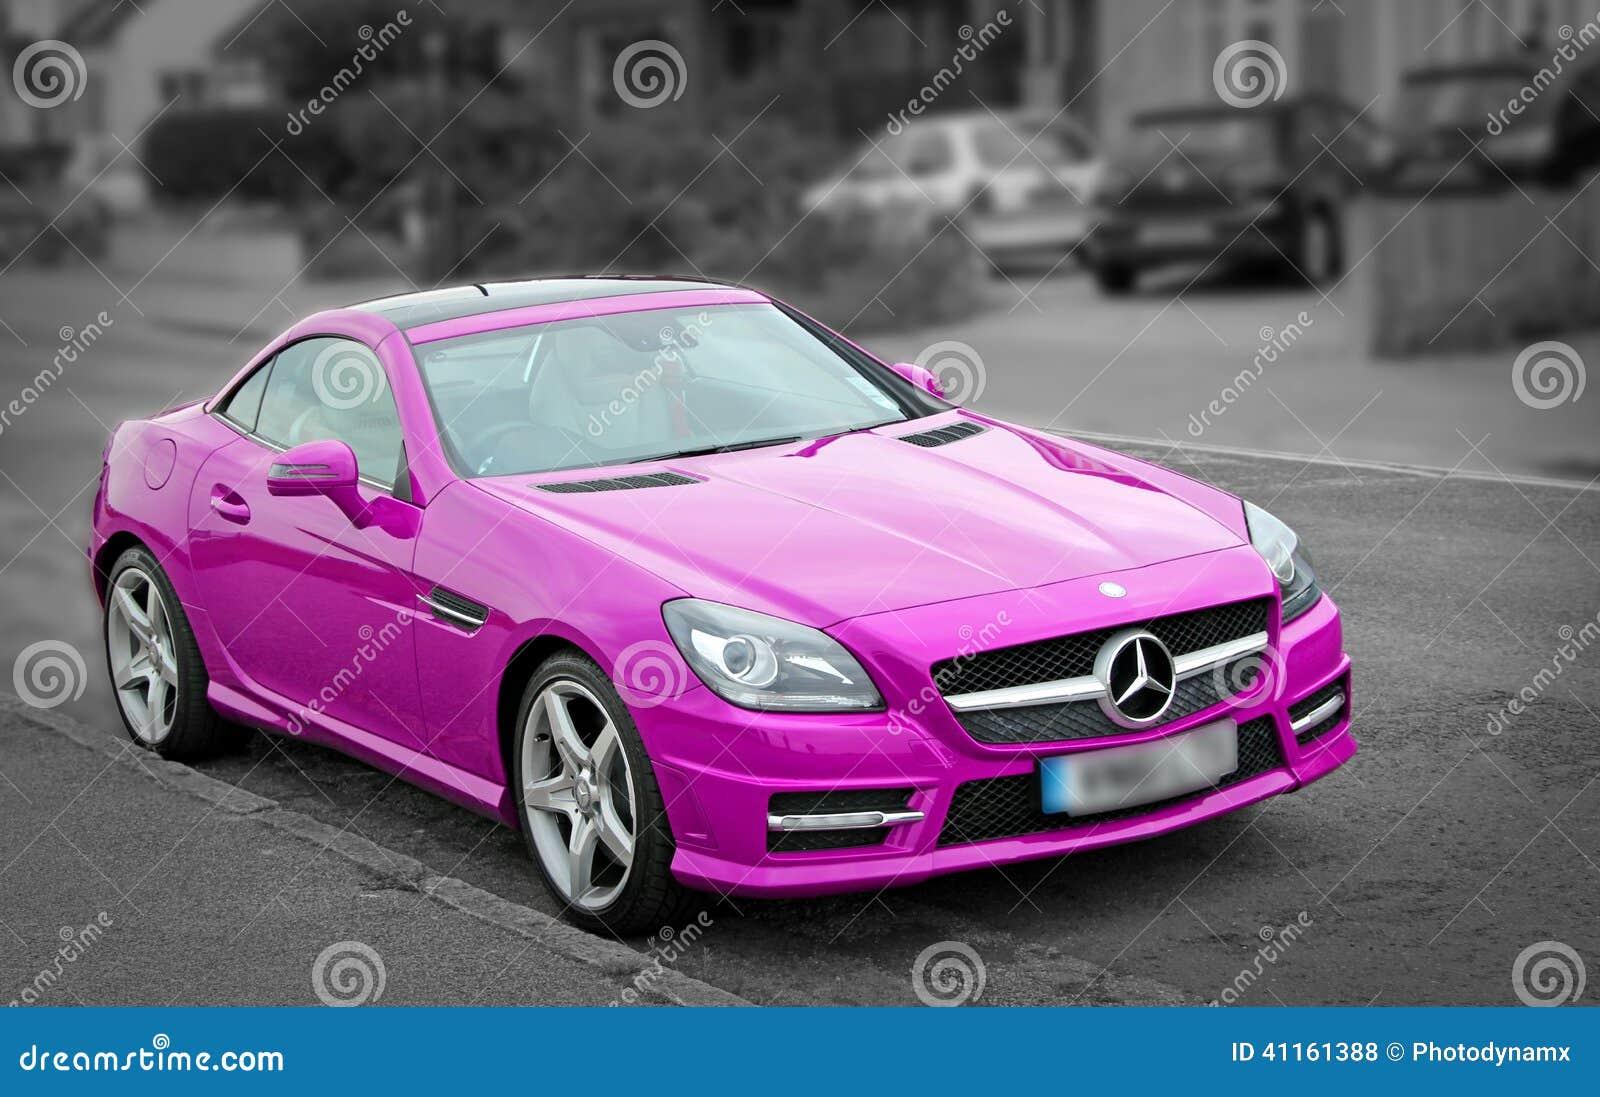 Acura Nsx 2017 1ra Prueba Manejo Japon besides Mercedes Classe E Coupe further 2016 Jaguar F Type Svr Us further 1971 89 Mercedes Benz SL further Foto De Stock Editorial Carro Cor De Rosa Luxuoso De Mercedes Slk Image41161388. on mercedes benz e convertible